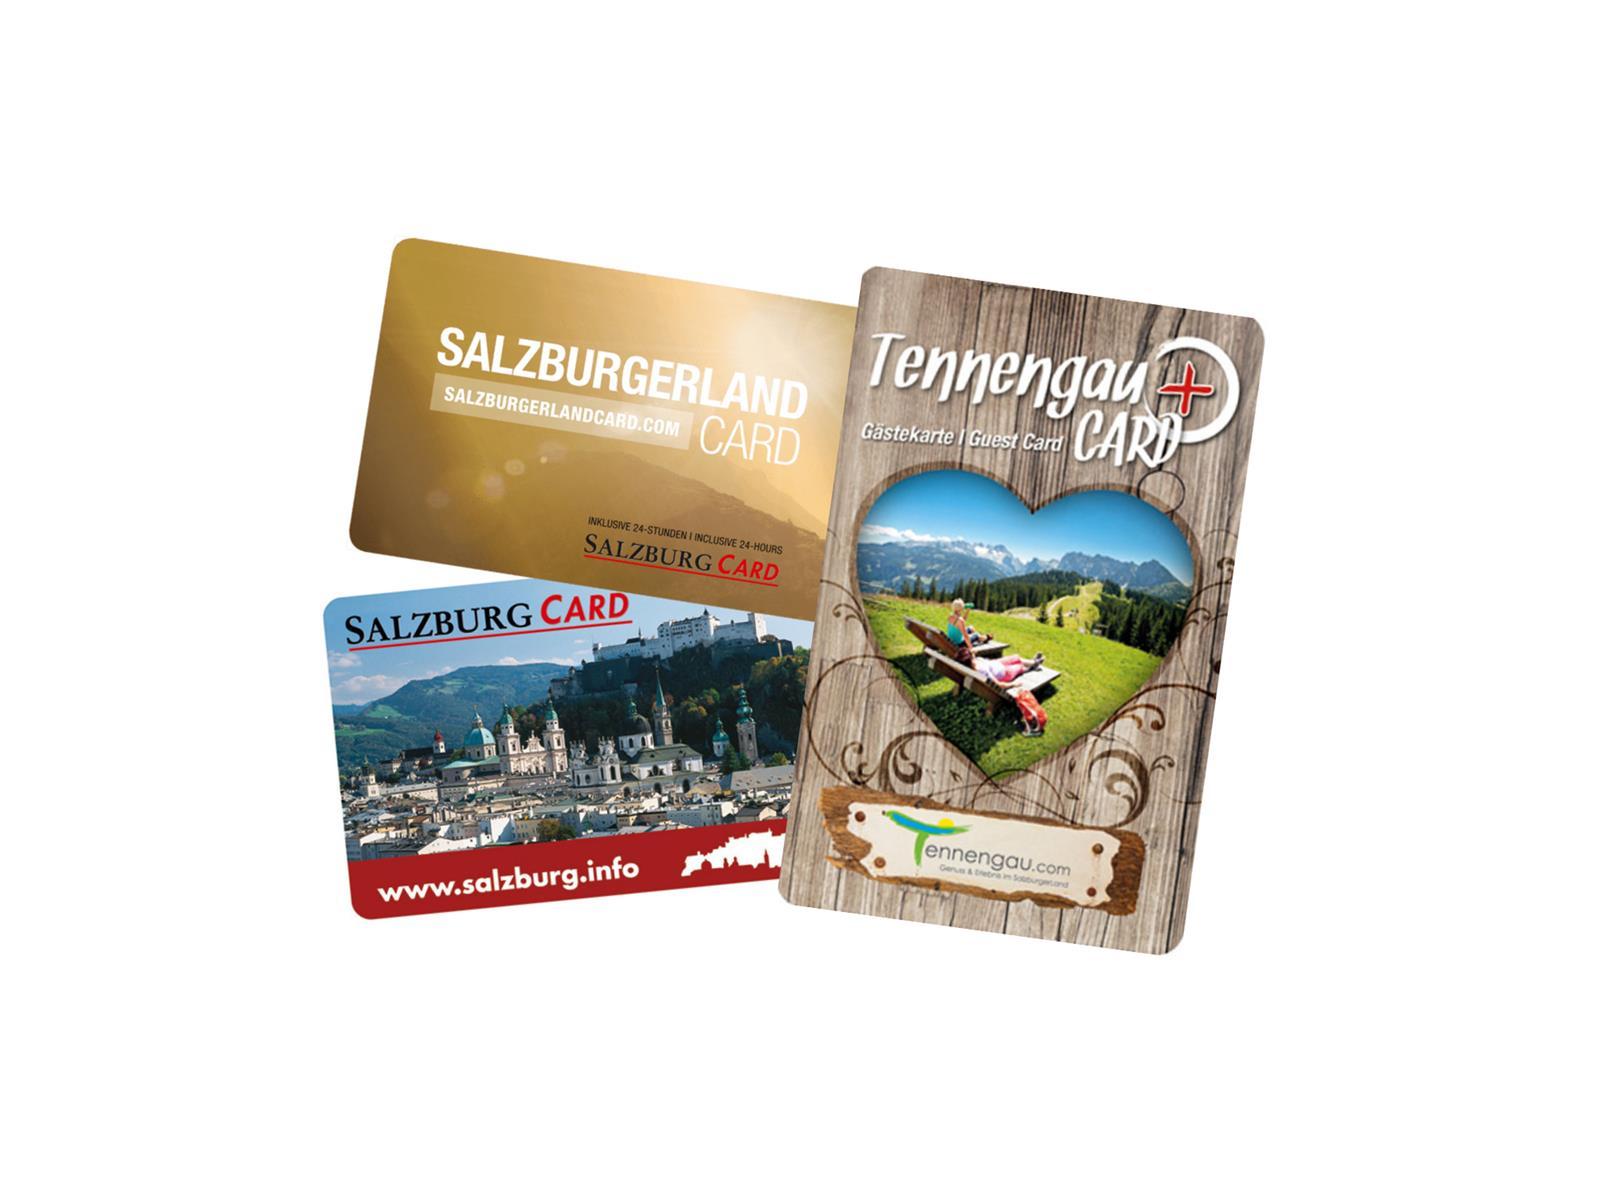 TennengauPLUS Card - SalzburgerLand Card - Salzburg Card | ©GST - SLT - TS